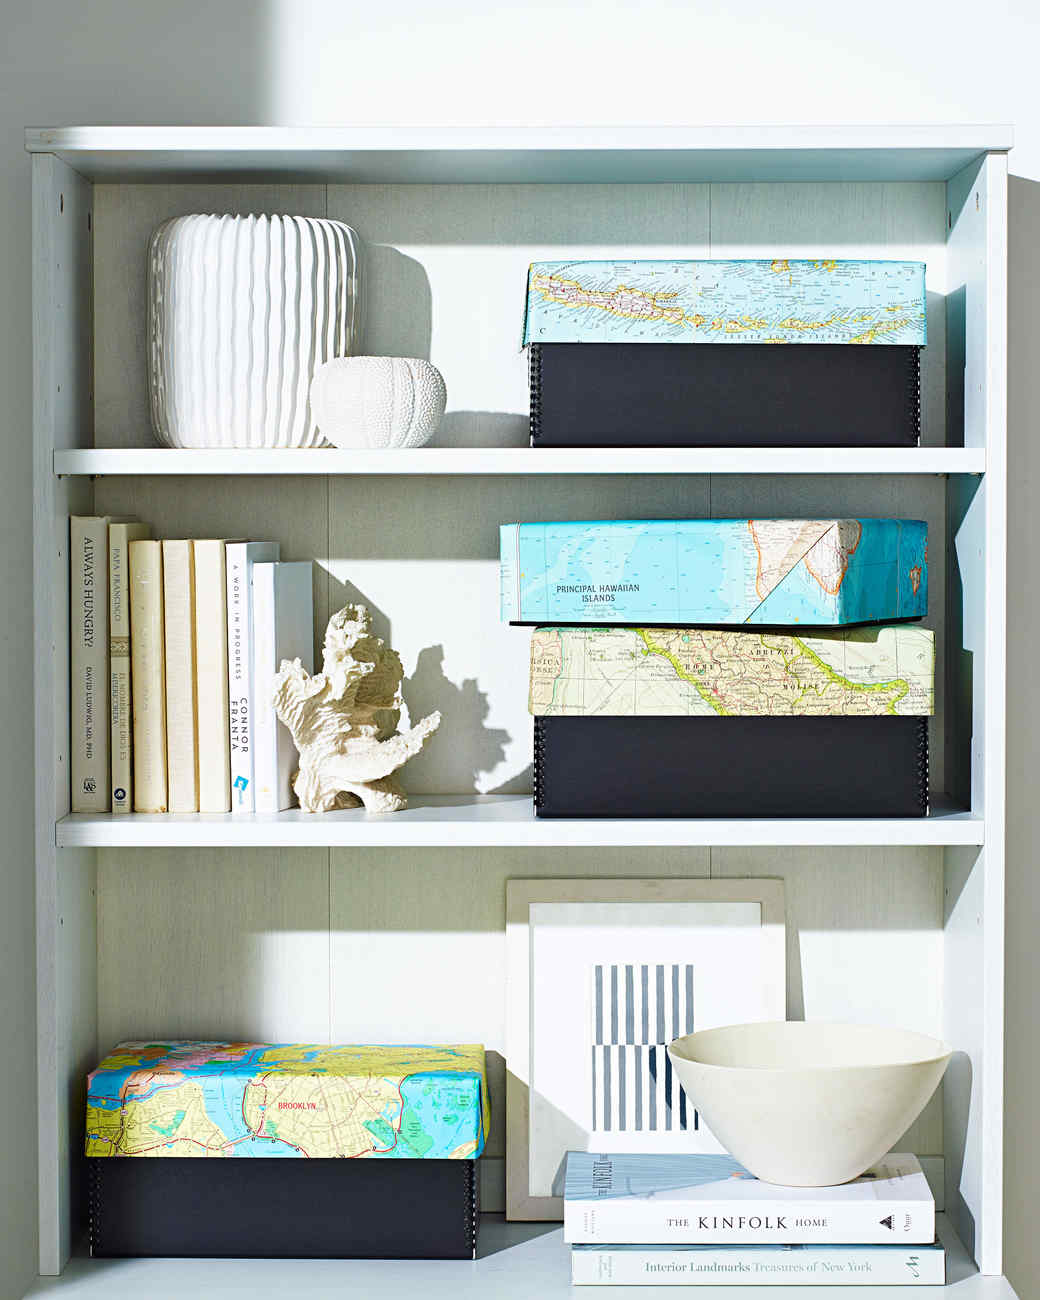 vacation memory box shelf